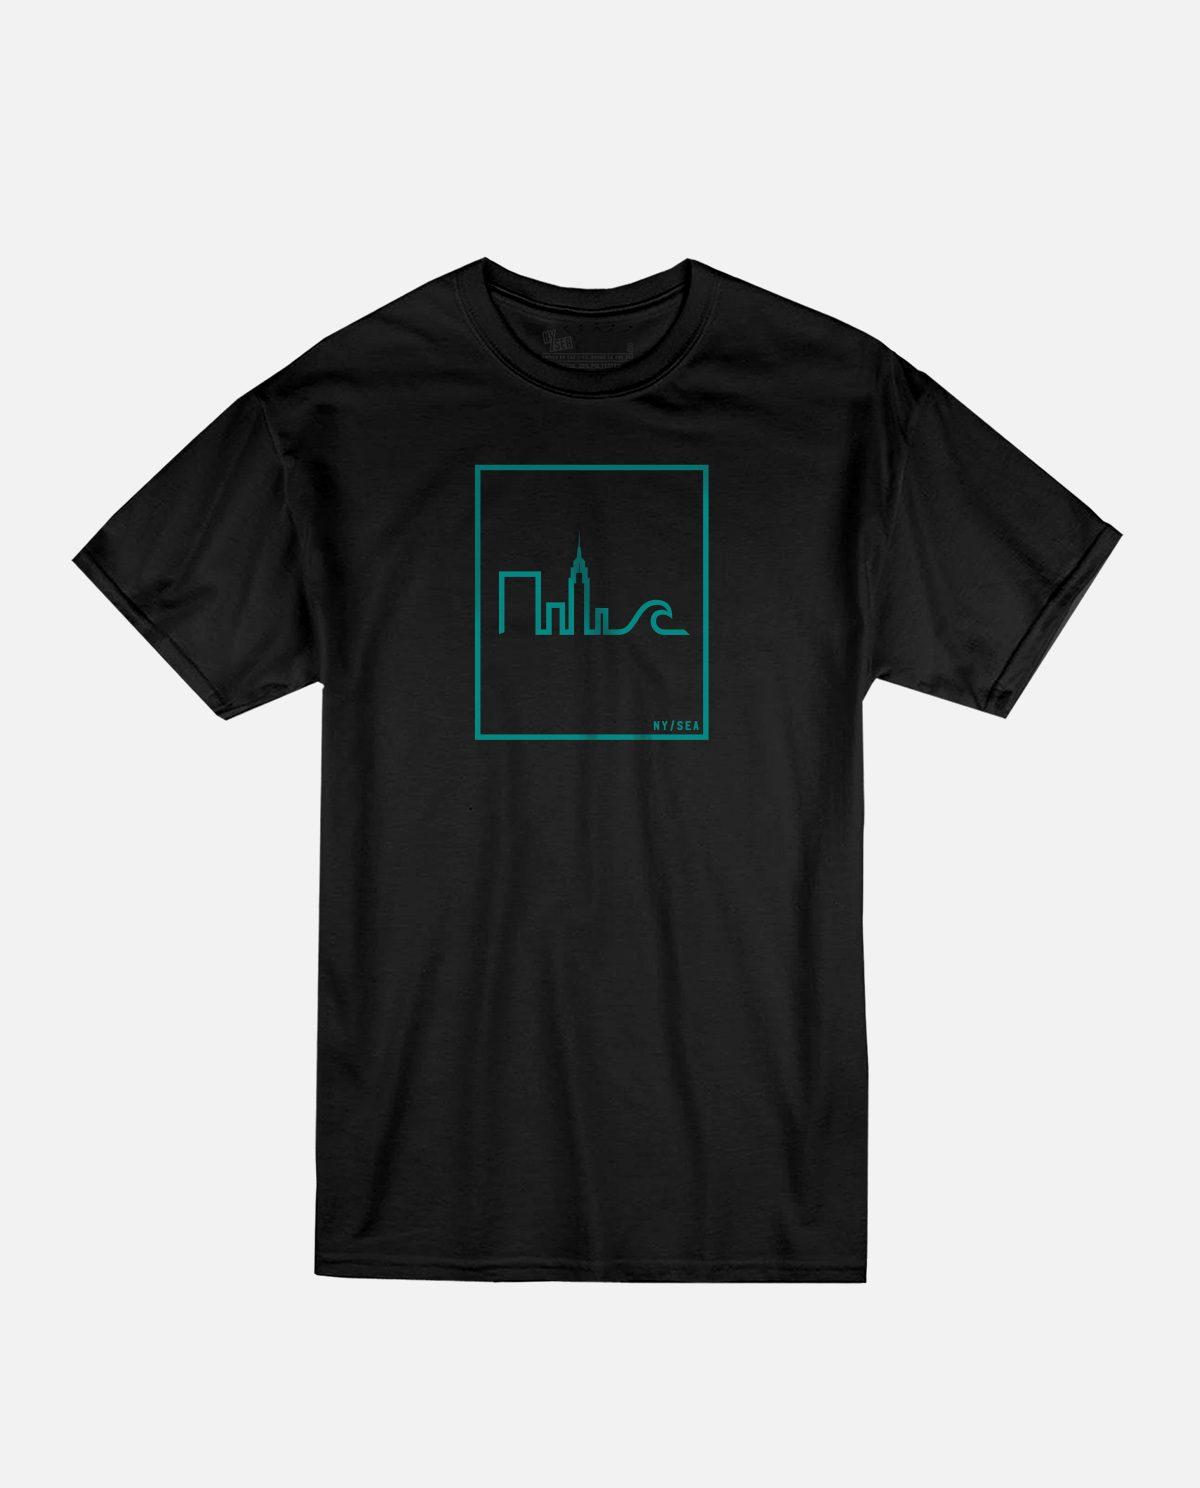 nysea-20wintercollection_skyline-tshirt